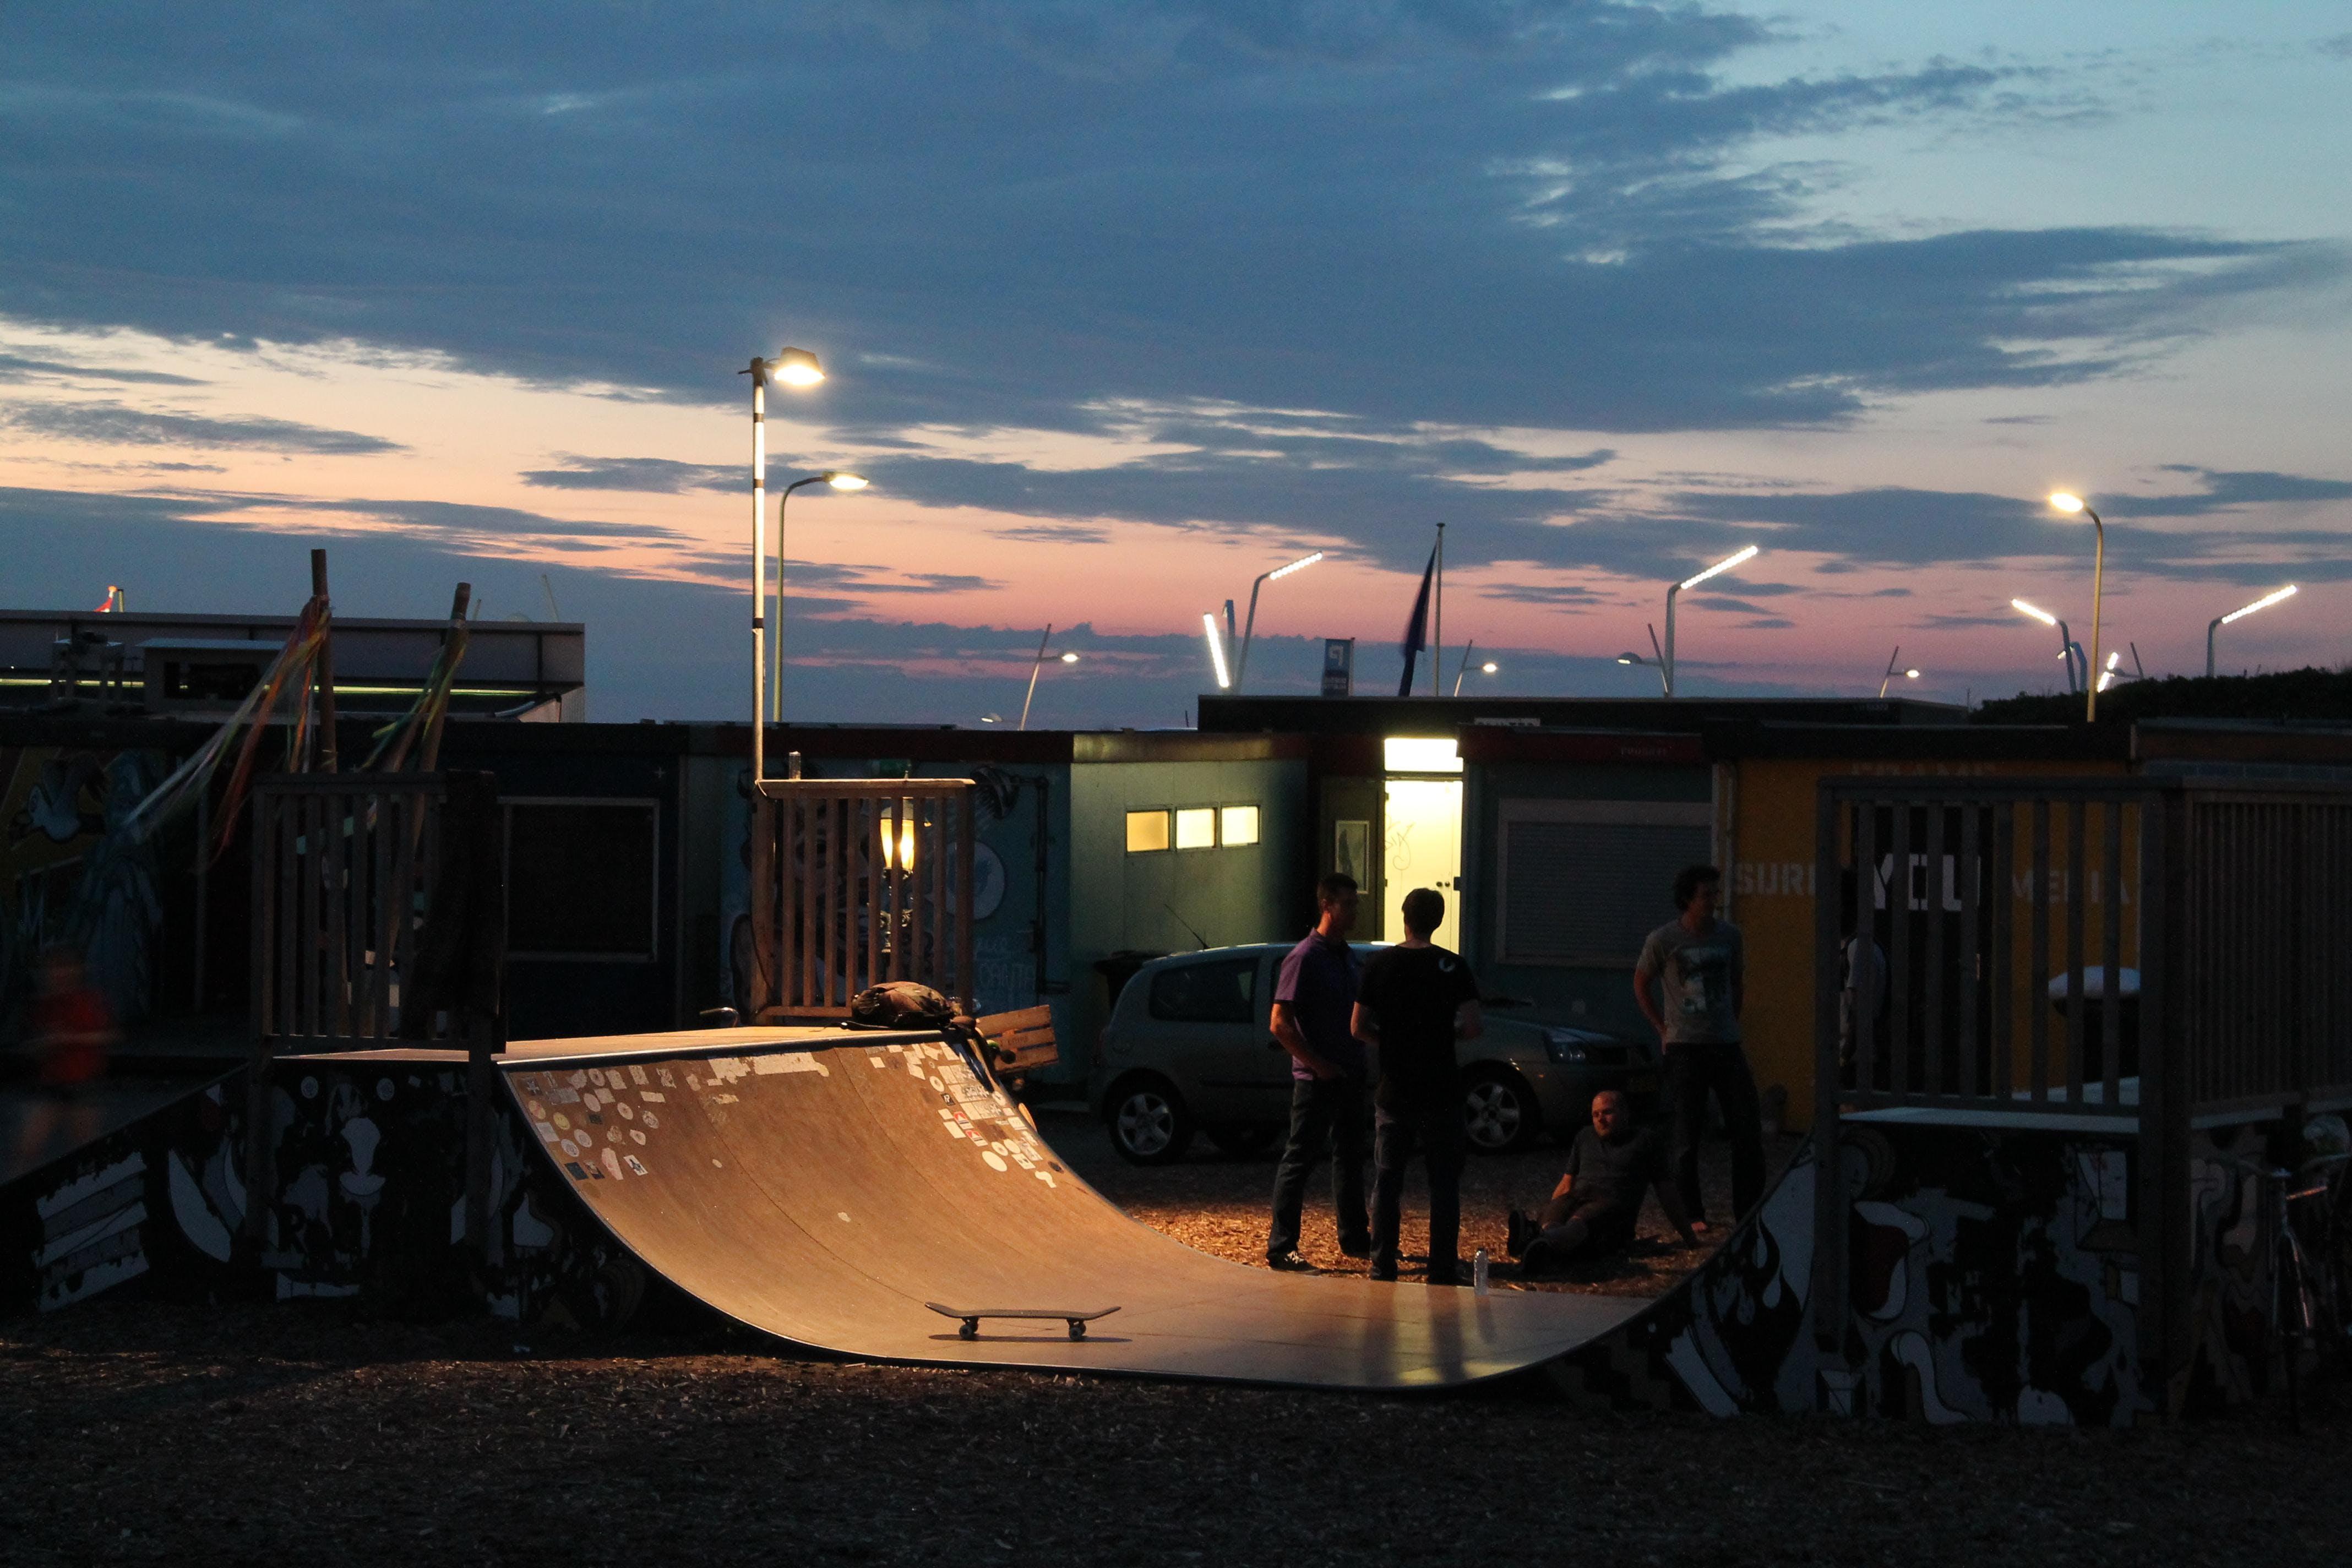 Maerlant Expo - Oude wereld omarmt nieuwe wer